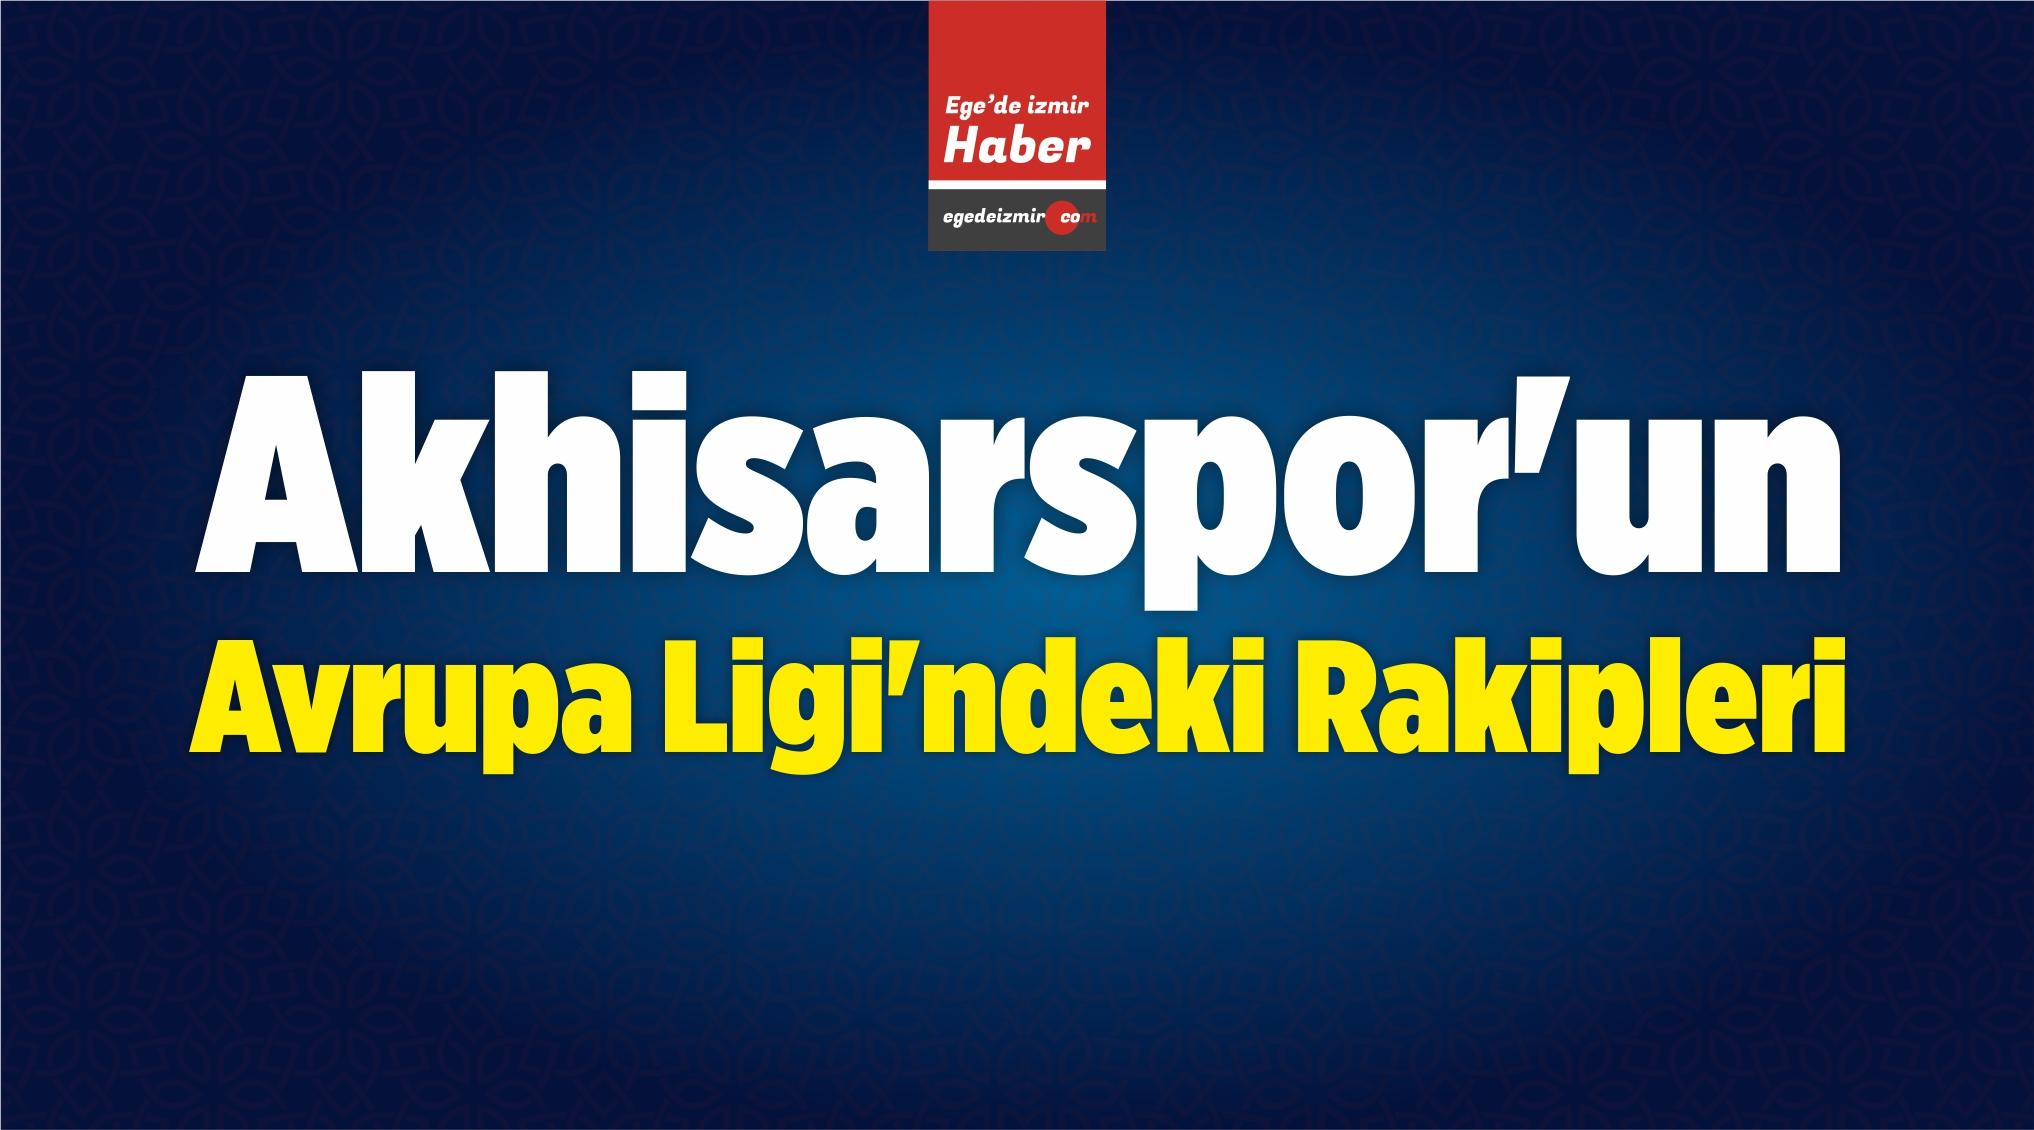 Akhisarspor'un UEFA Avrupa Ligi'ndeki Rakipleri